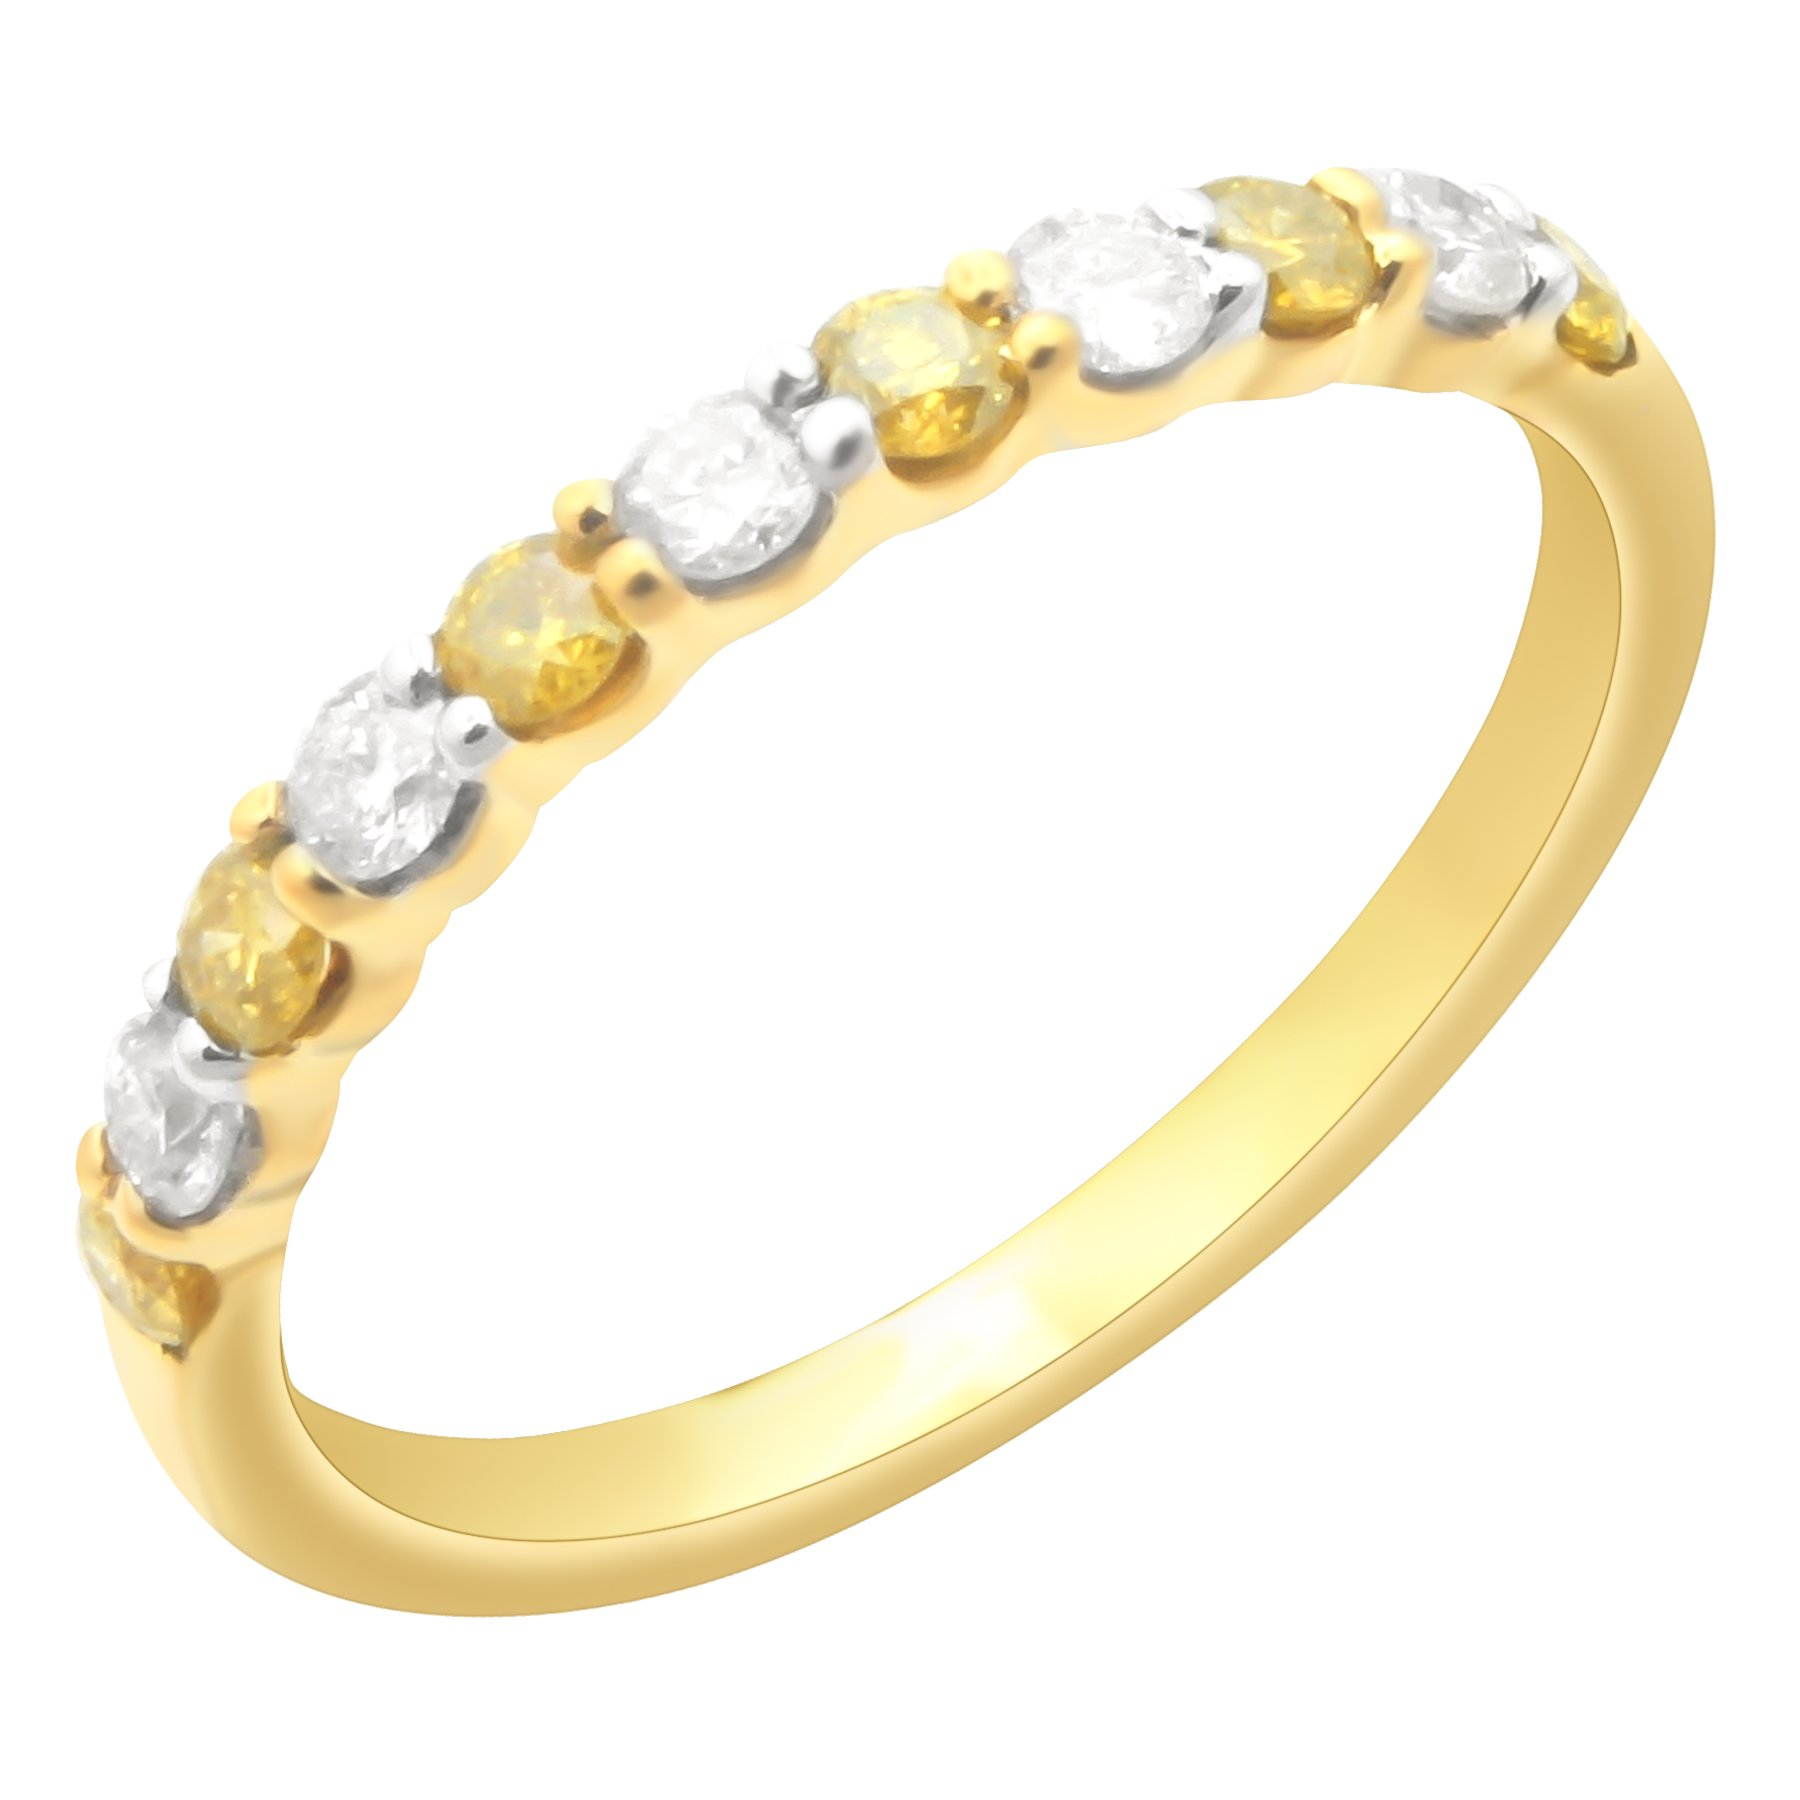 Prism Jewel 0.50Ct Prong Set Yellow Diamond & Natural Diamond Wedding Band, Yellow Gold Plated Silver, Size 5